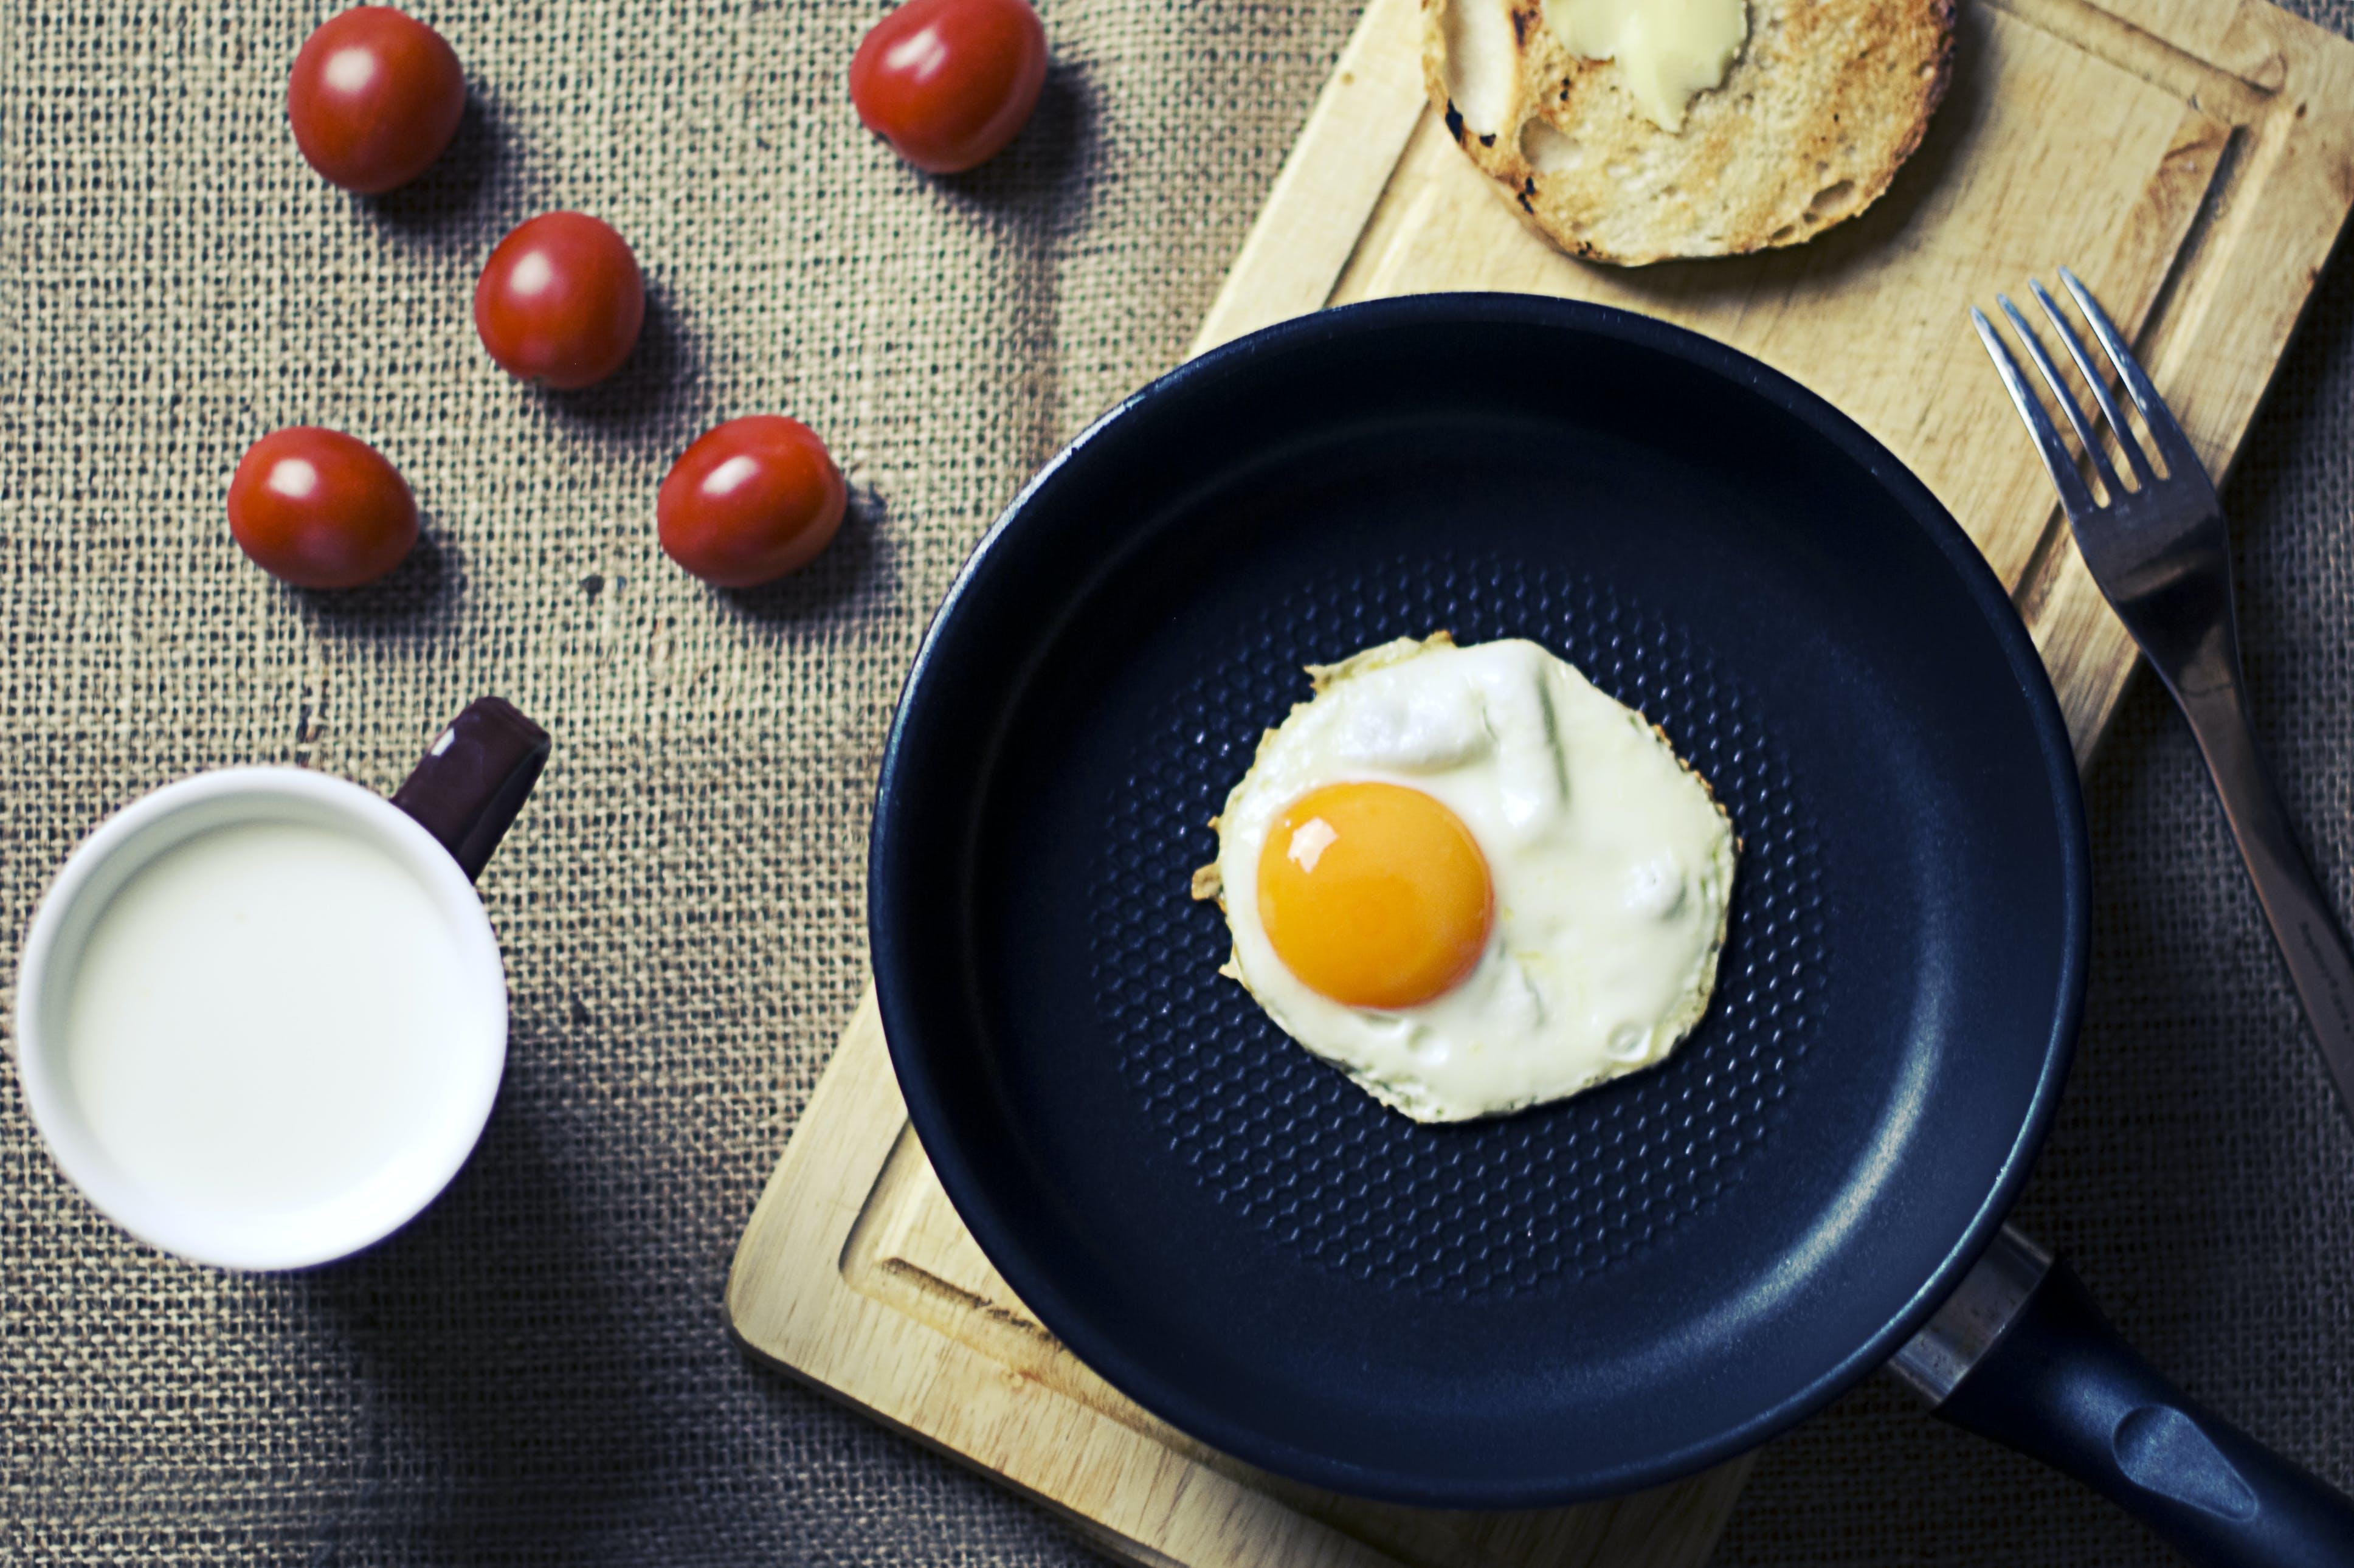 Fried Egg in Frying Pan Beside Mug